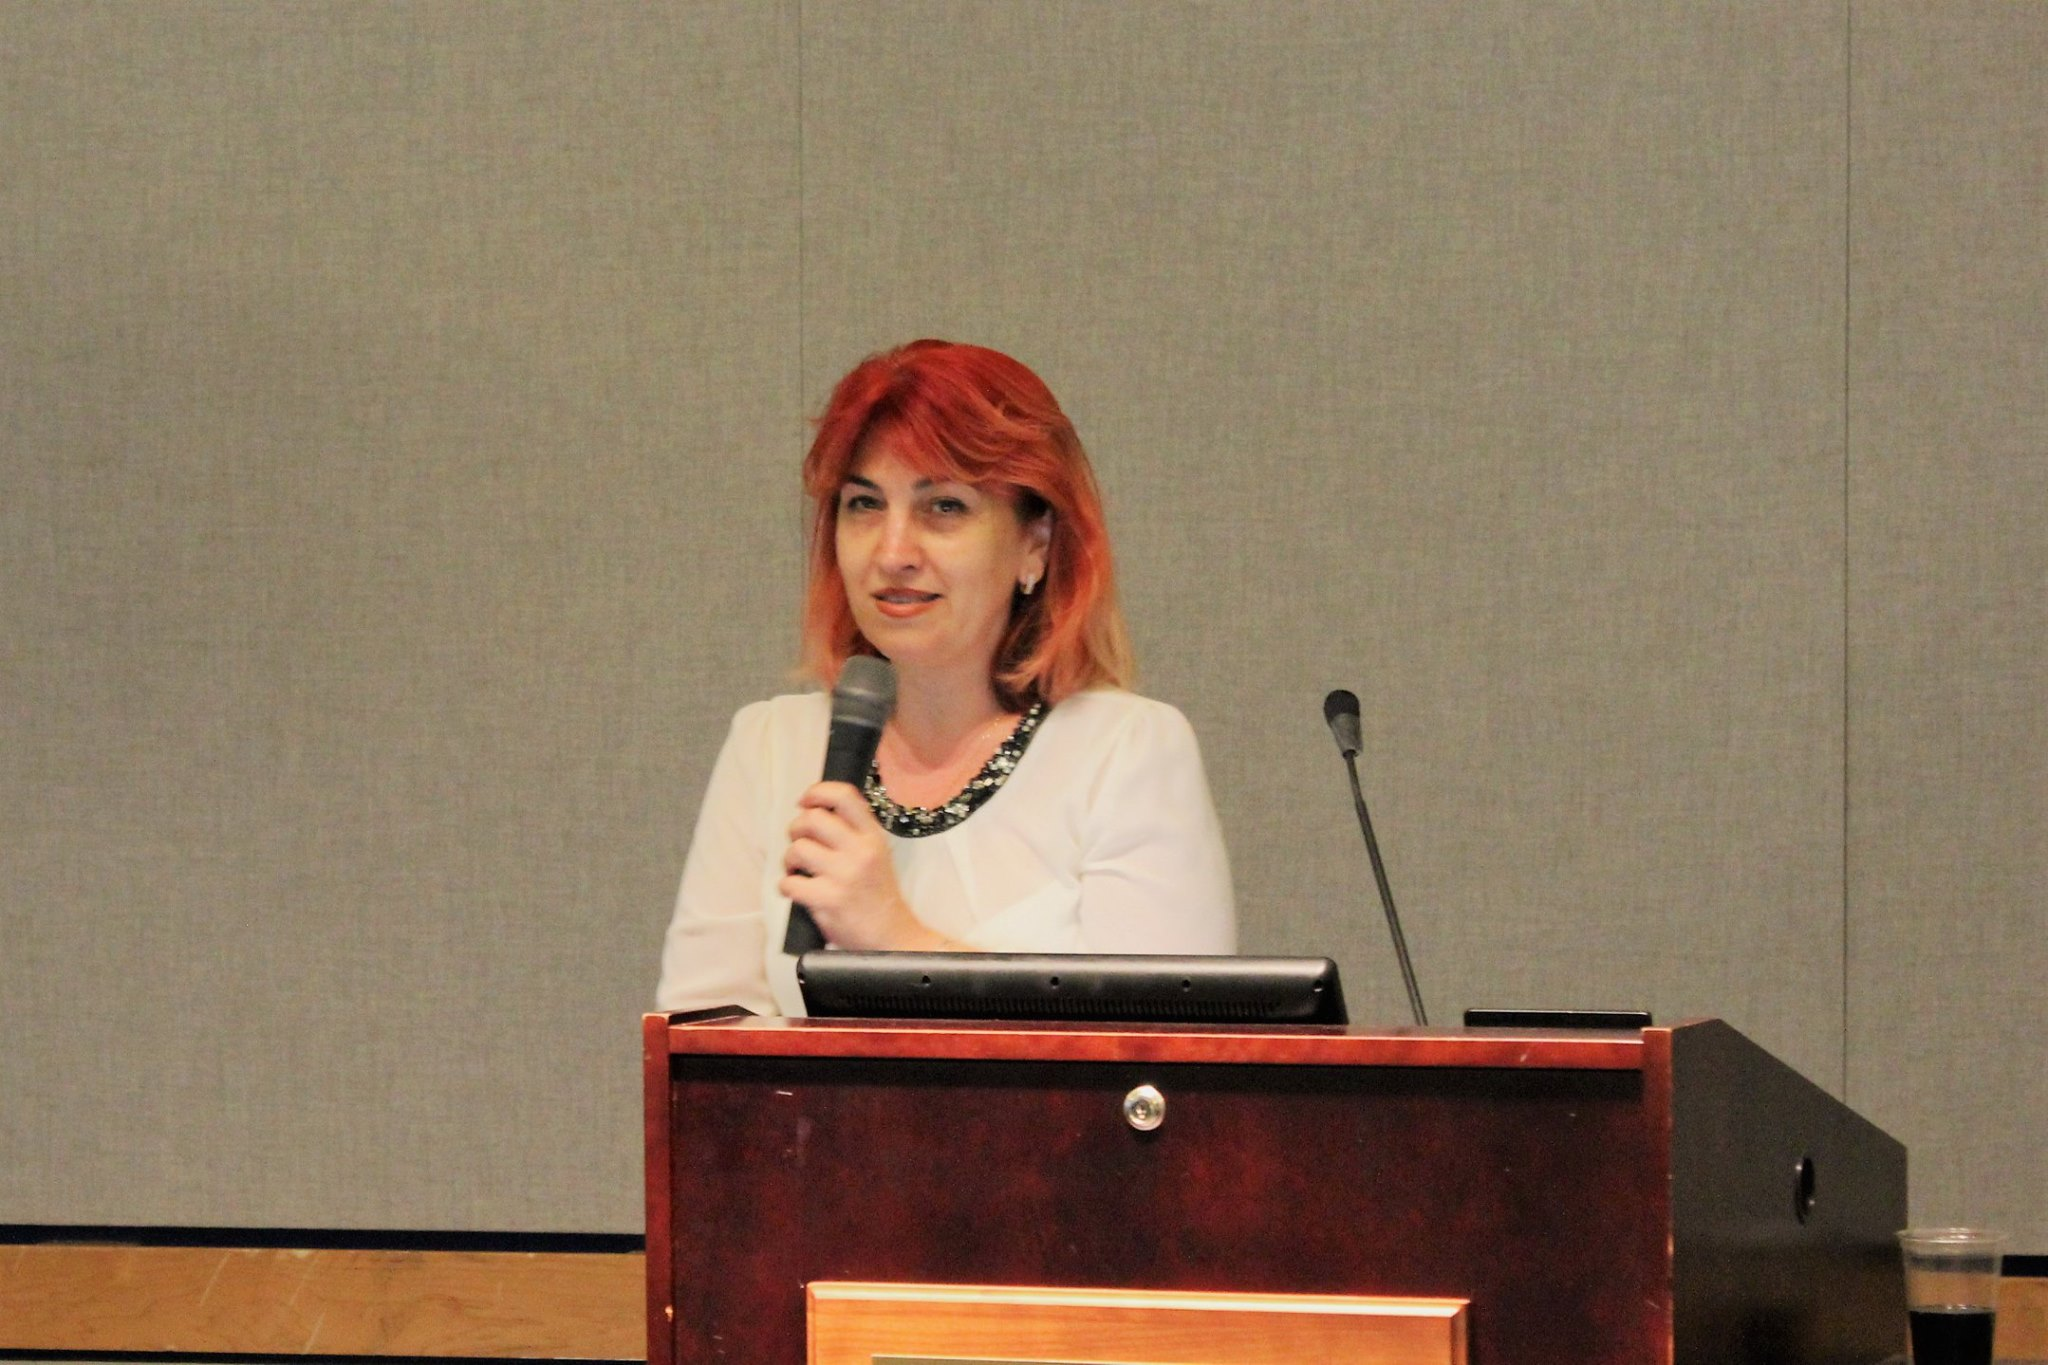 Beatrice Ioan, PhD, MD, MA, University of Medicine and Pharmacy, Iasi, Romania Vasile Astarastoae